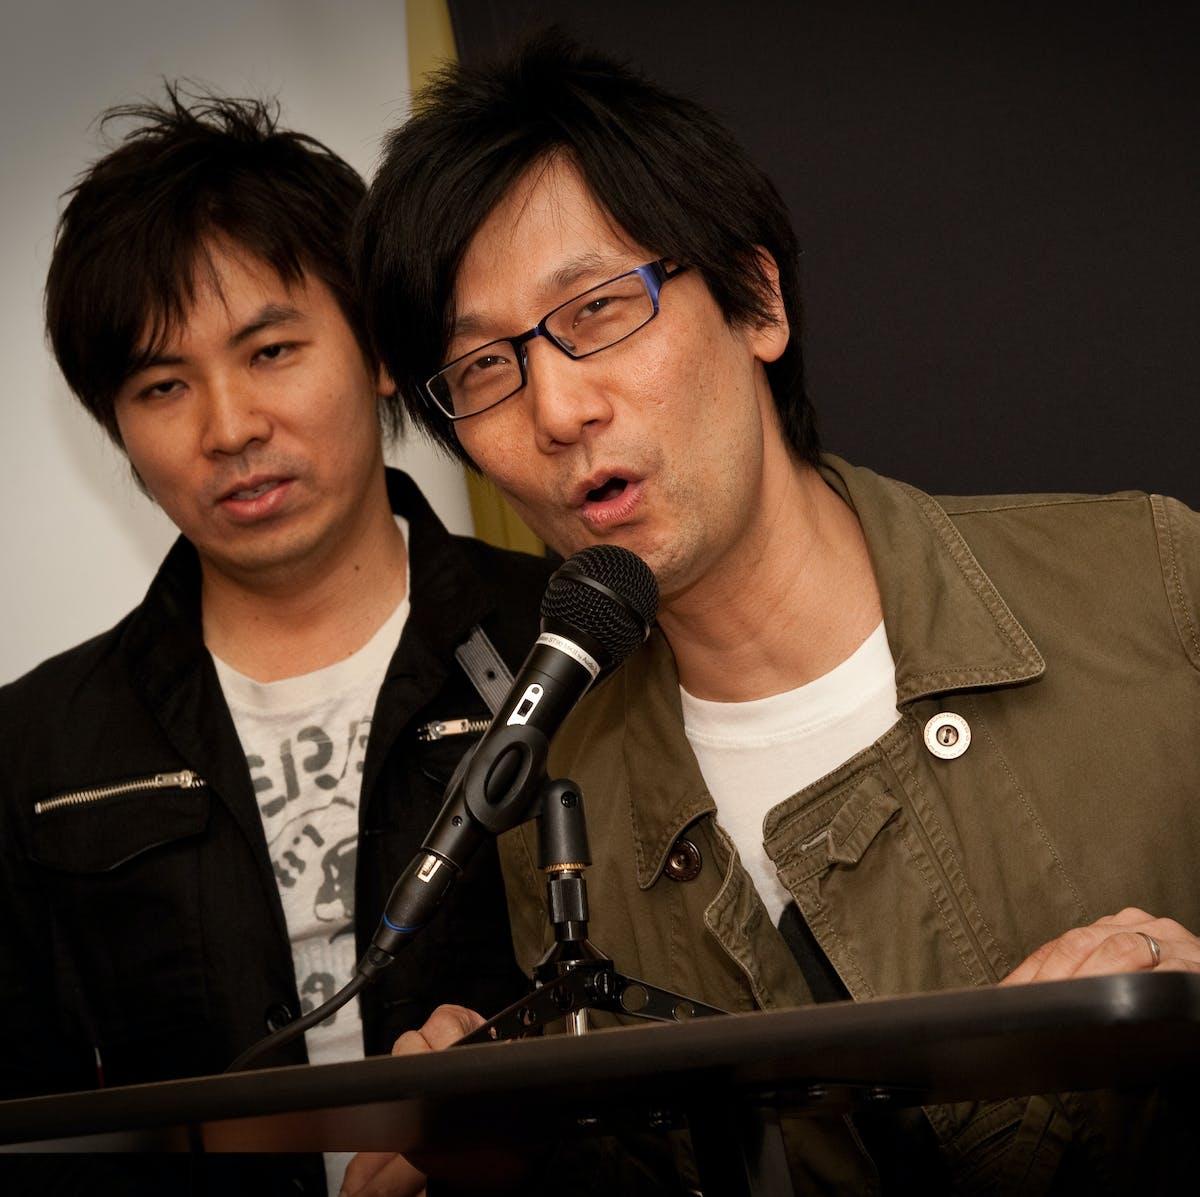 'Death Stranding' Plot: Kojima Doesn't Get It, but We'll Learn More Soon